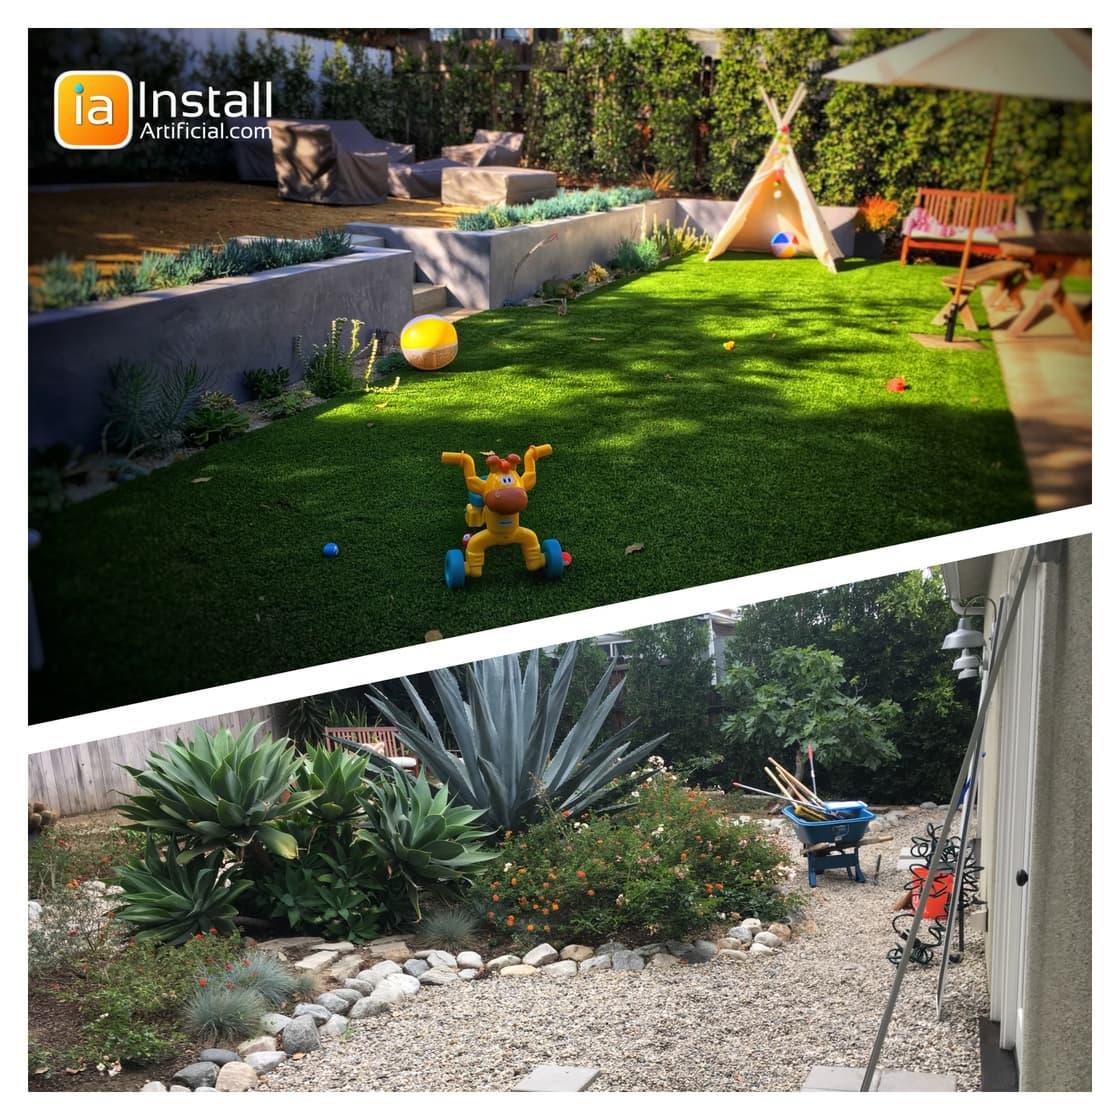 Retaining wall, fireplace, drainage, artificial turf